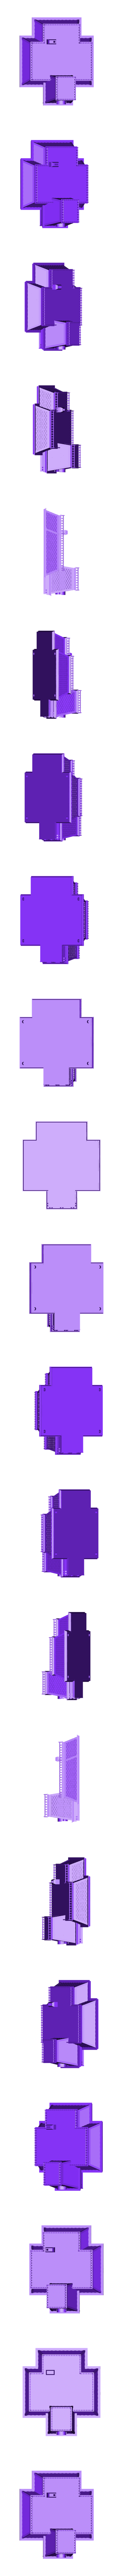 roof.stl Download STL file bates motel house psycho house • 3D printable object, PatricioVazquez